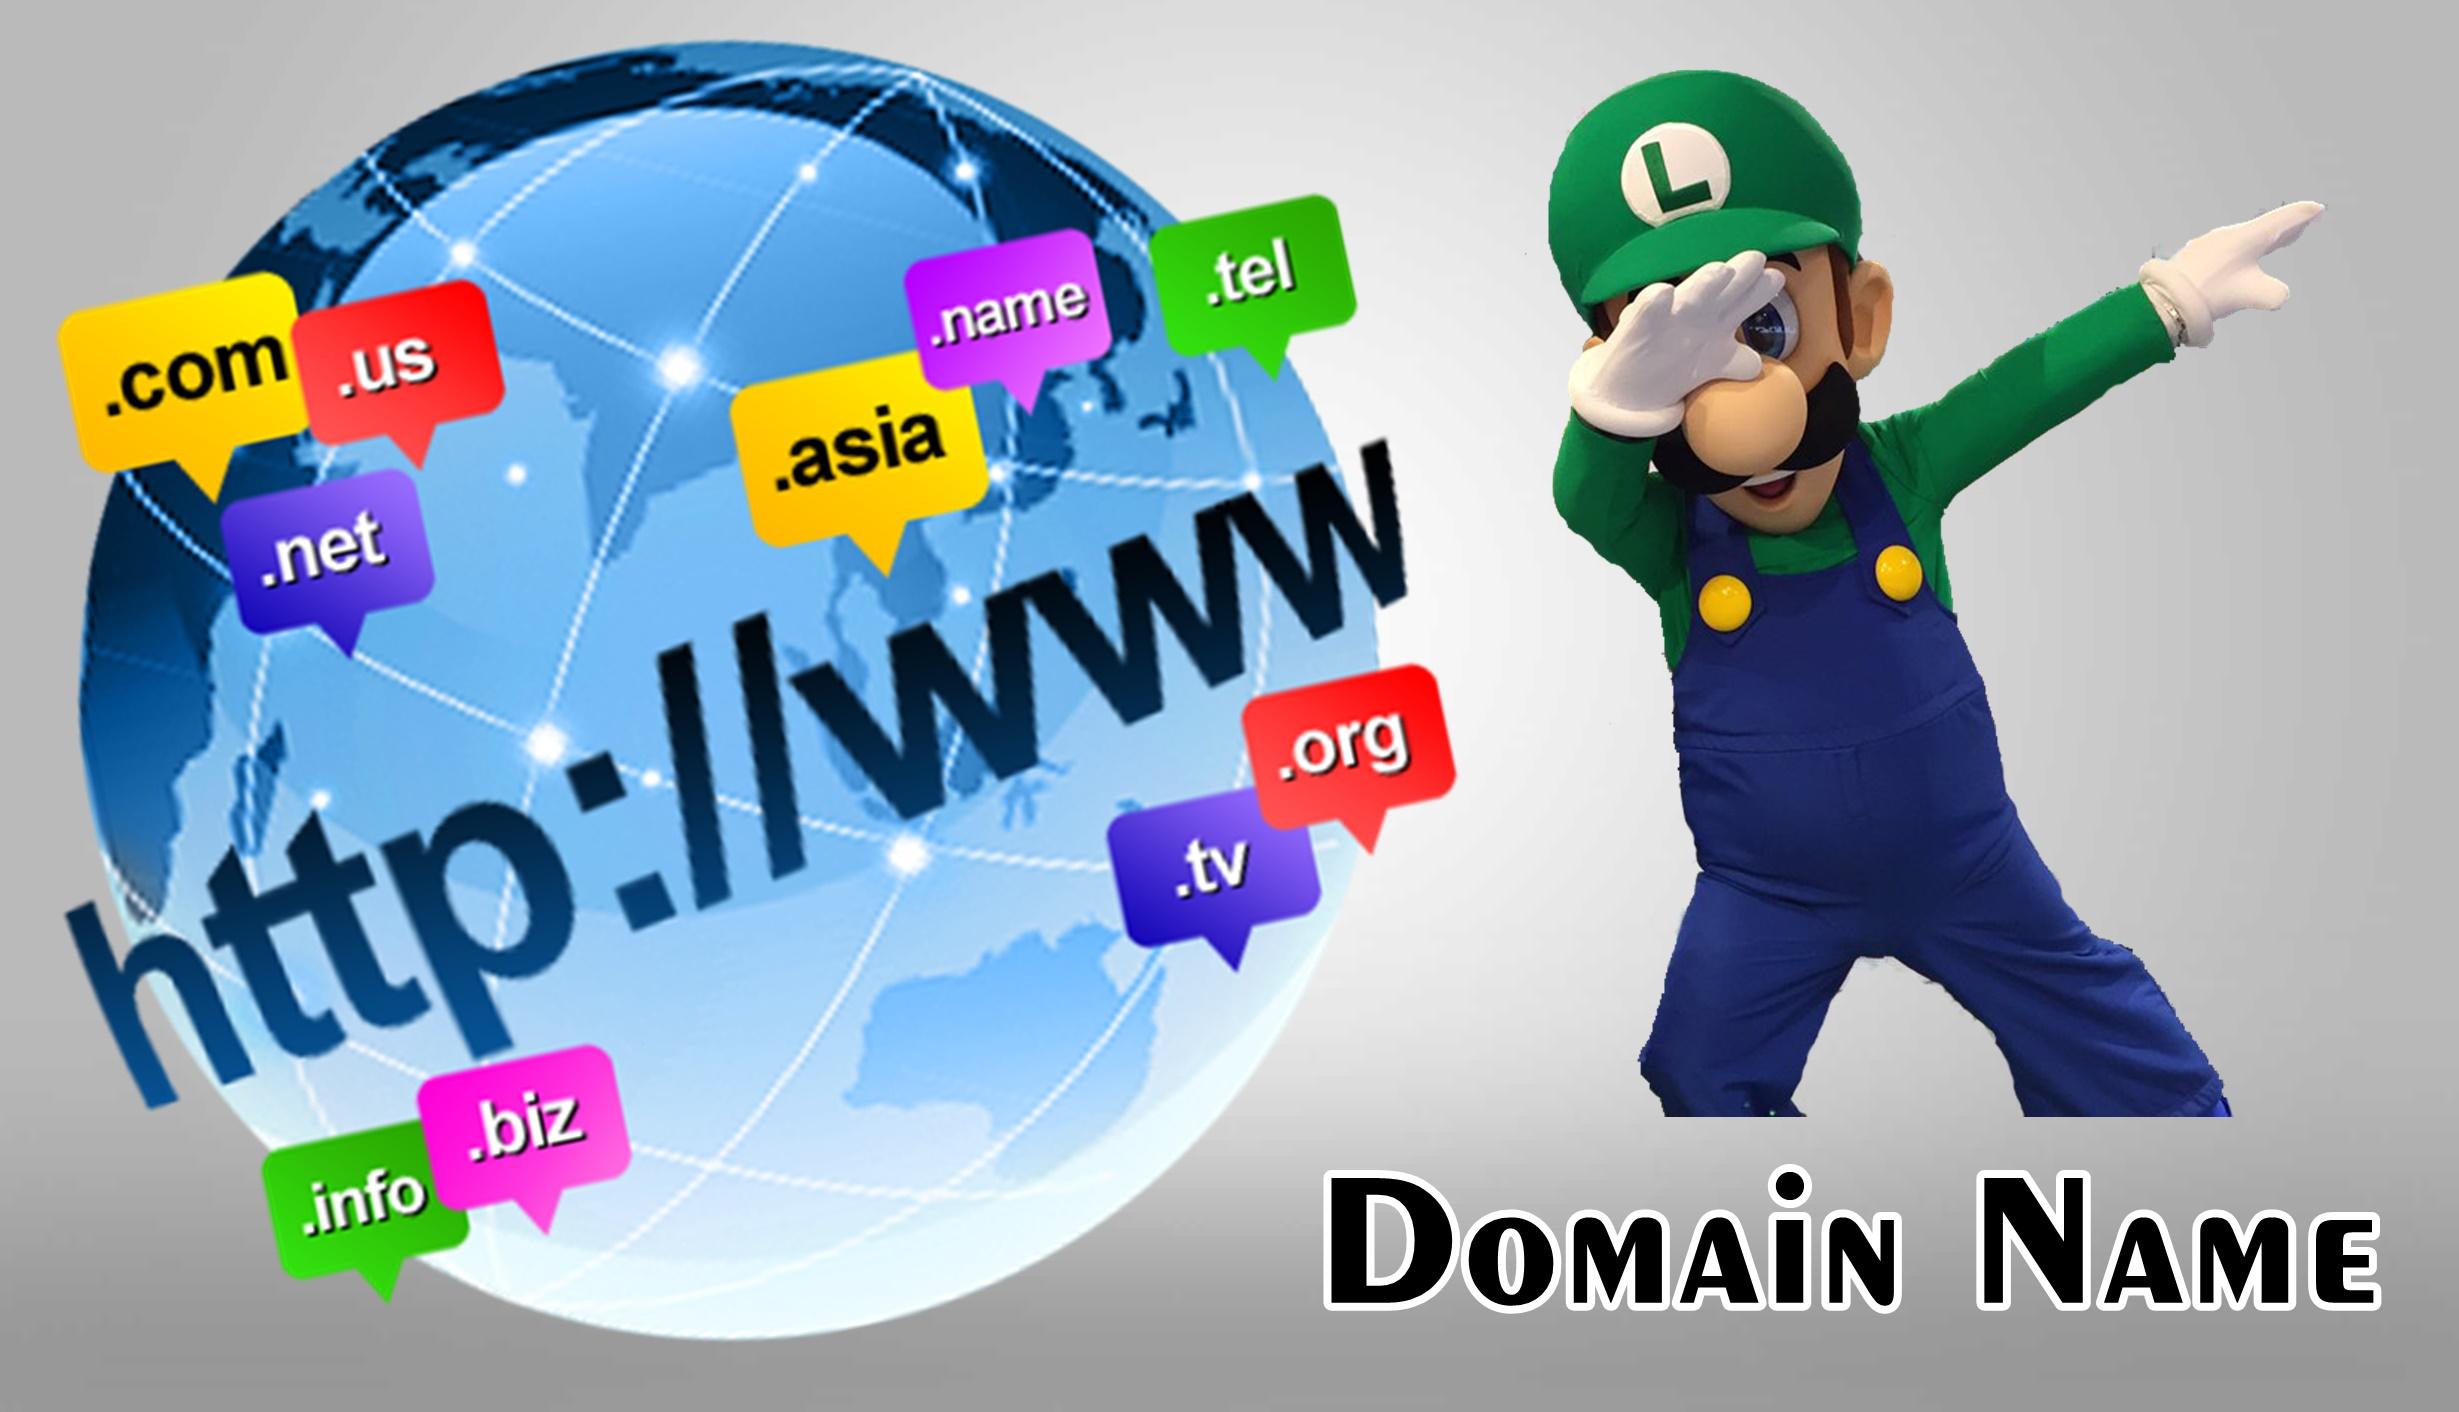 What is Domain? Domain ဆိုတာ Online အသံုးျပဳရန္ အမည္ တစ္ခုပါ။ ဥပမာ လူတိုင္းမွာ အမည္ကိုယ္စီရွိၾကပါတယ္။ ေမာင္ေမာင္၊ ေဇာ္ေဇာ္.. စသျဖင့္ေပါ့။   ဒီလိုပါပဲ အင္တာနက္နဲ႕ ခ်ိတ္ဆက္ေဆာင္ရြက္တဲ့အခါမွာလည္း သက္ဆိုင္ရာ အင္တာနက္မွနာမည္ကို သိရွိေစဖို႕မိမိနဲ႕ သင့္ေတာ္ရာ အမည္တစ္ခုကို ေပးၾကရပါတယ္။ Bagan Directory လုပ္ငန္းကို အင္တာနက္တြင္ အမည္ေပးခ်ိတ္ထားခ်င္တယ္ဆိုရင္..Bagandirectory.comor bagan.directory စသျဖင့္ Domain အမည္မ်ိဳးစံုေရြးခ်ယ္ေပးလို႕ရပါတယ္။ Do you need…